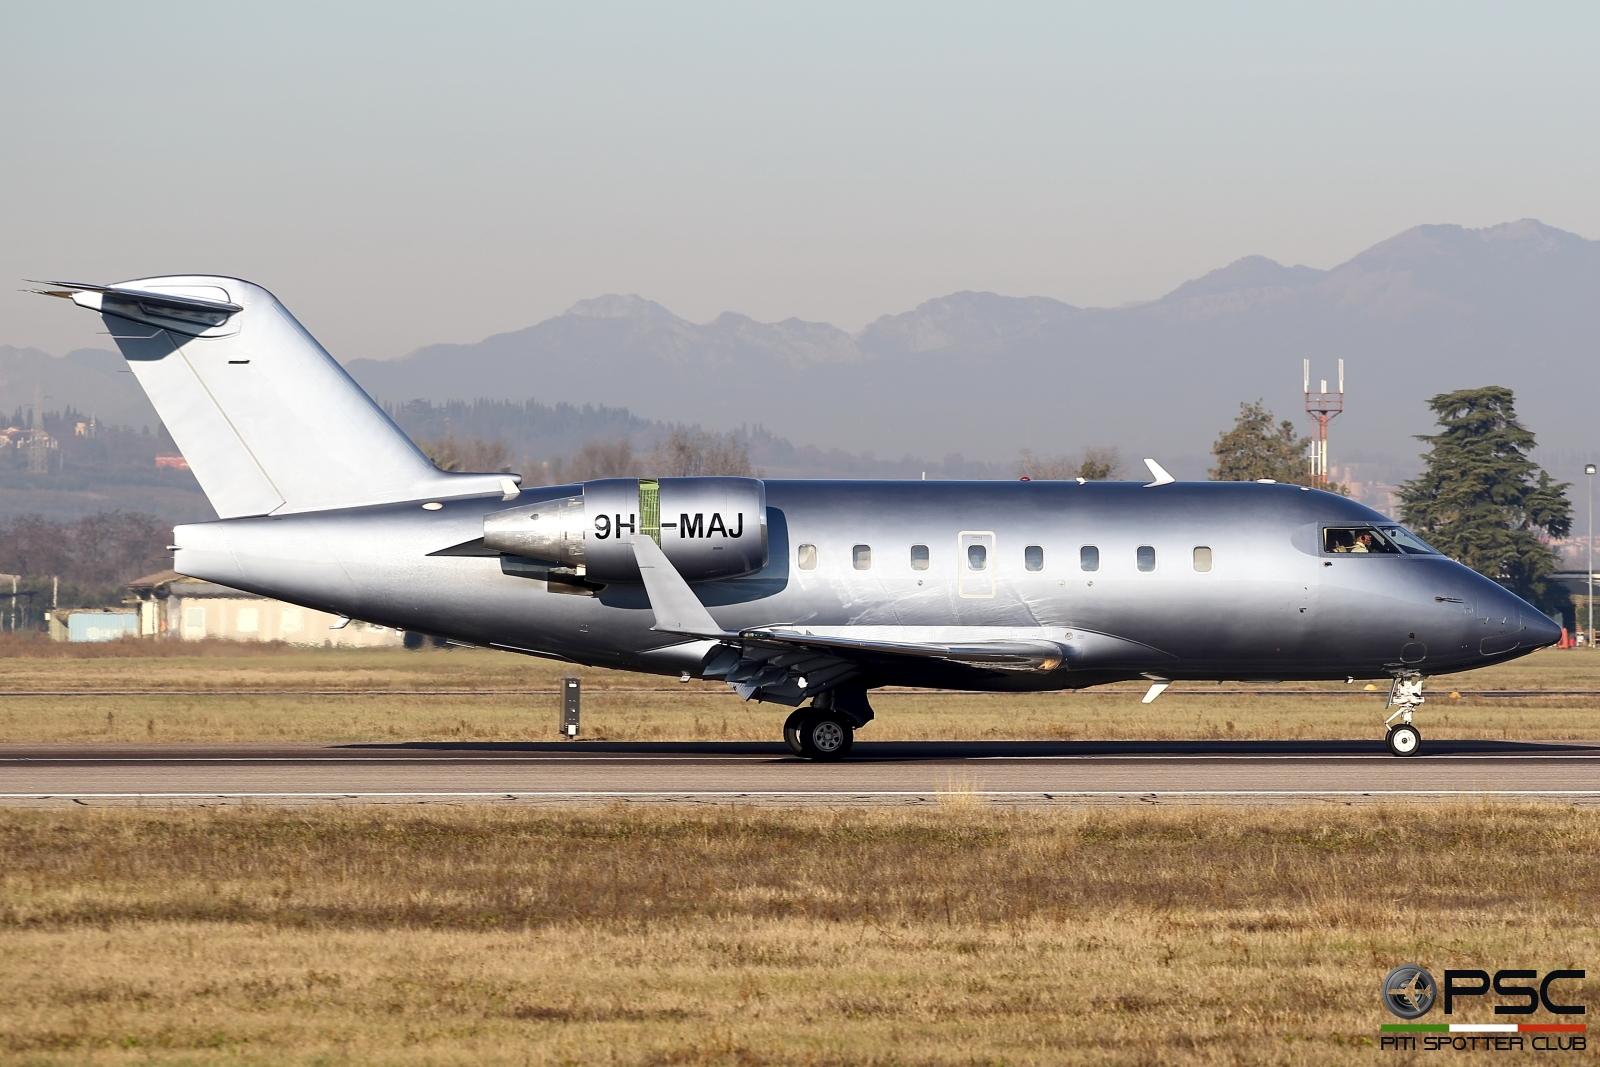 9H-MAJ CL-604 5508 Elit'Avia Malta @ Aeroporto di Verona - 2017 © Piti Spotter Club Verona